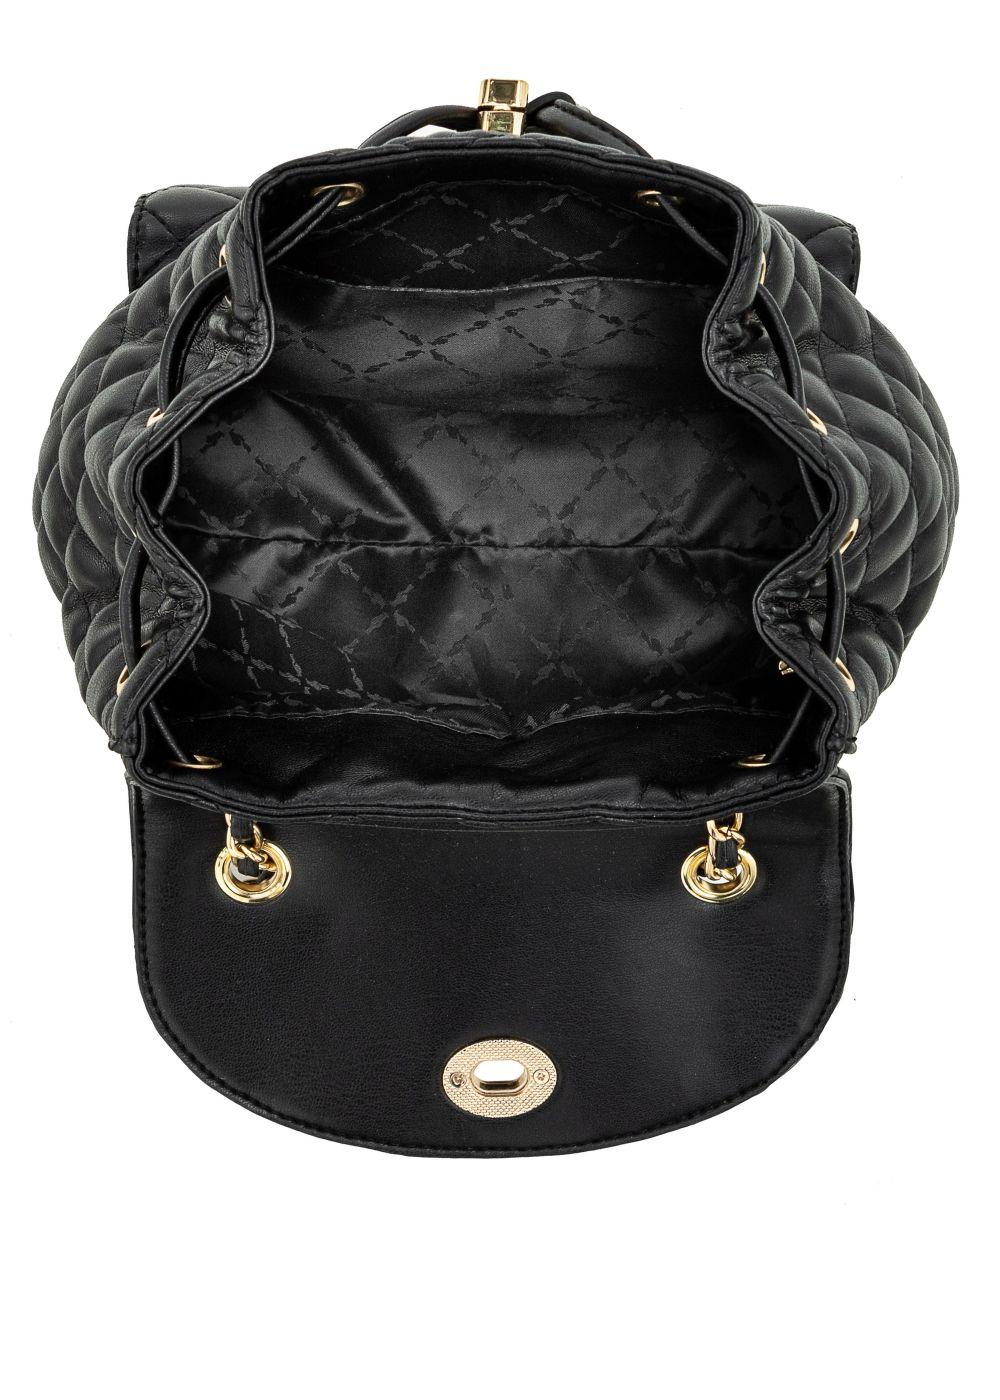 Plecak damski TOREC-0445-99(W21)